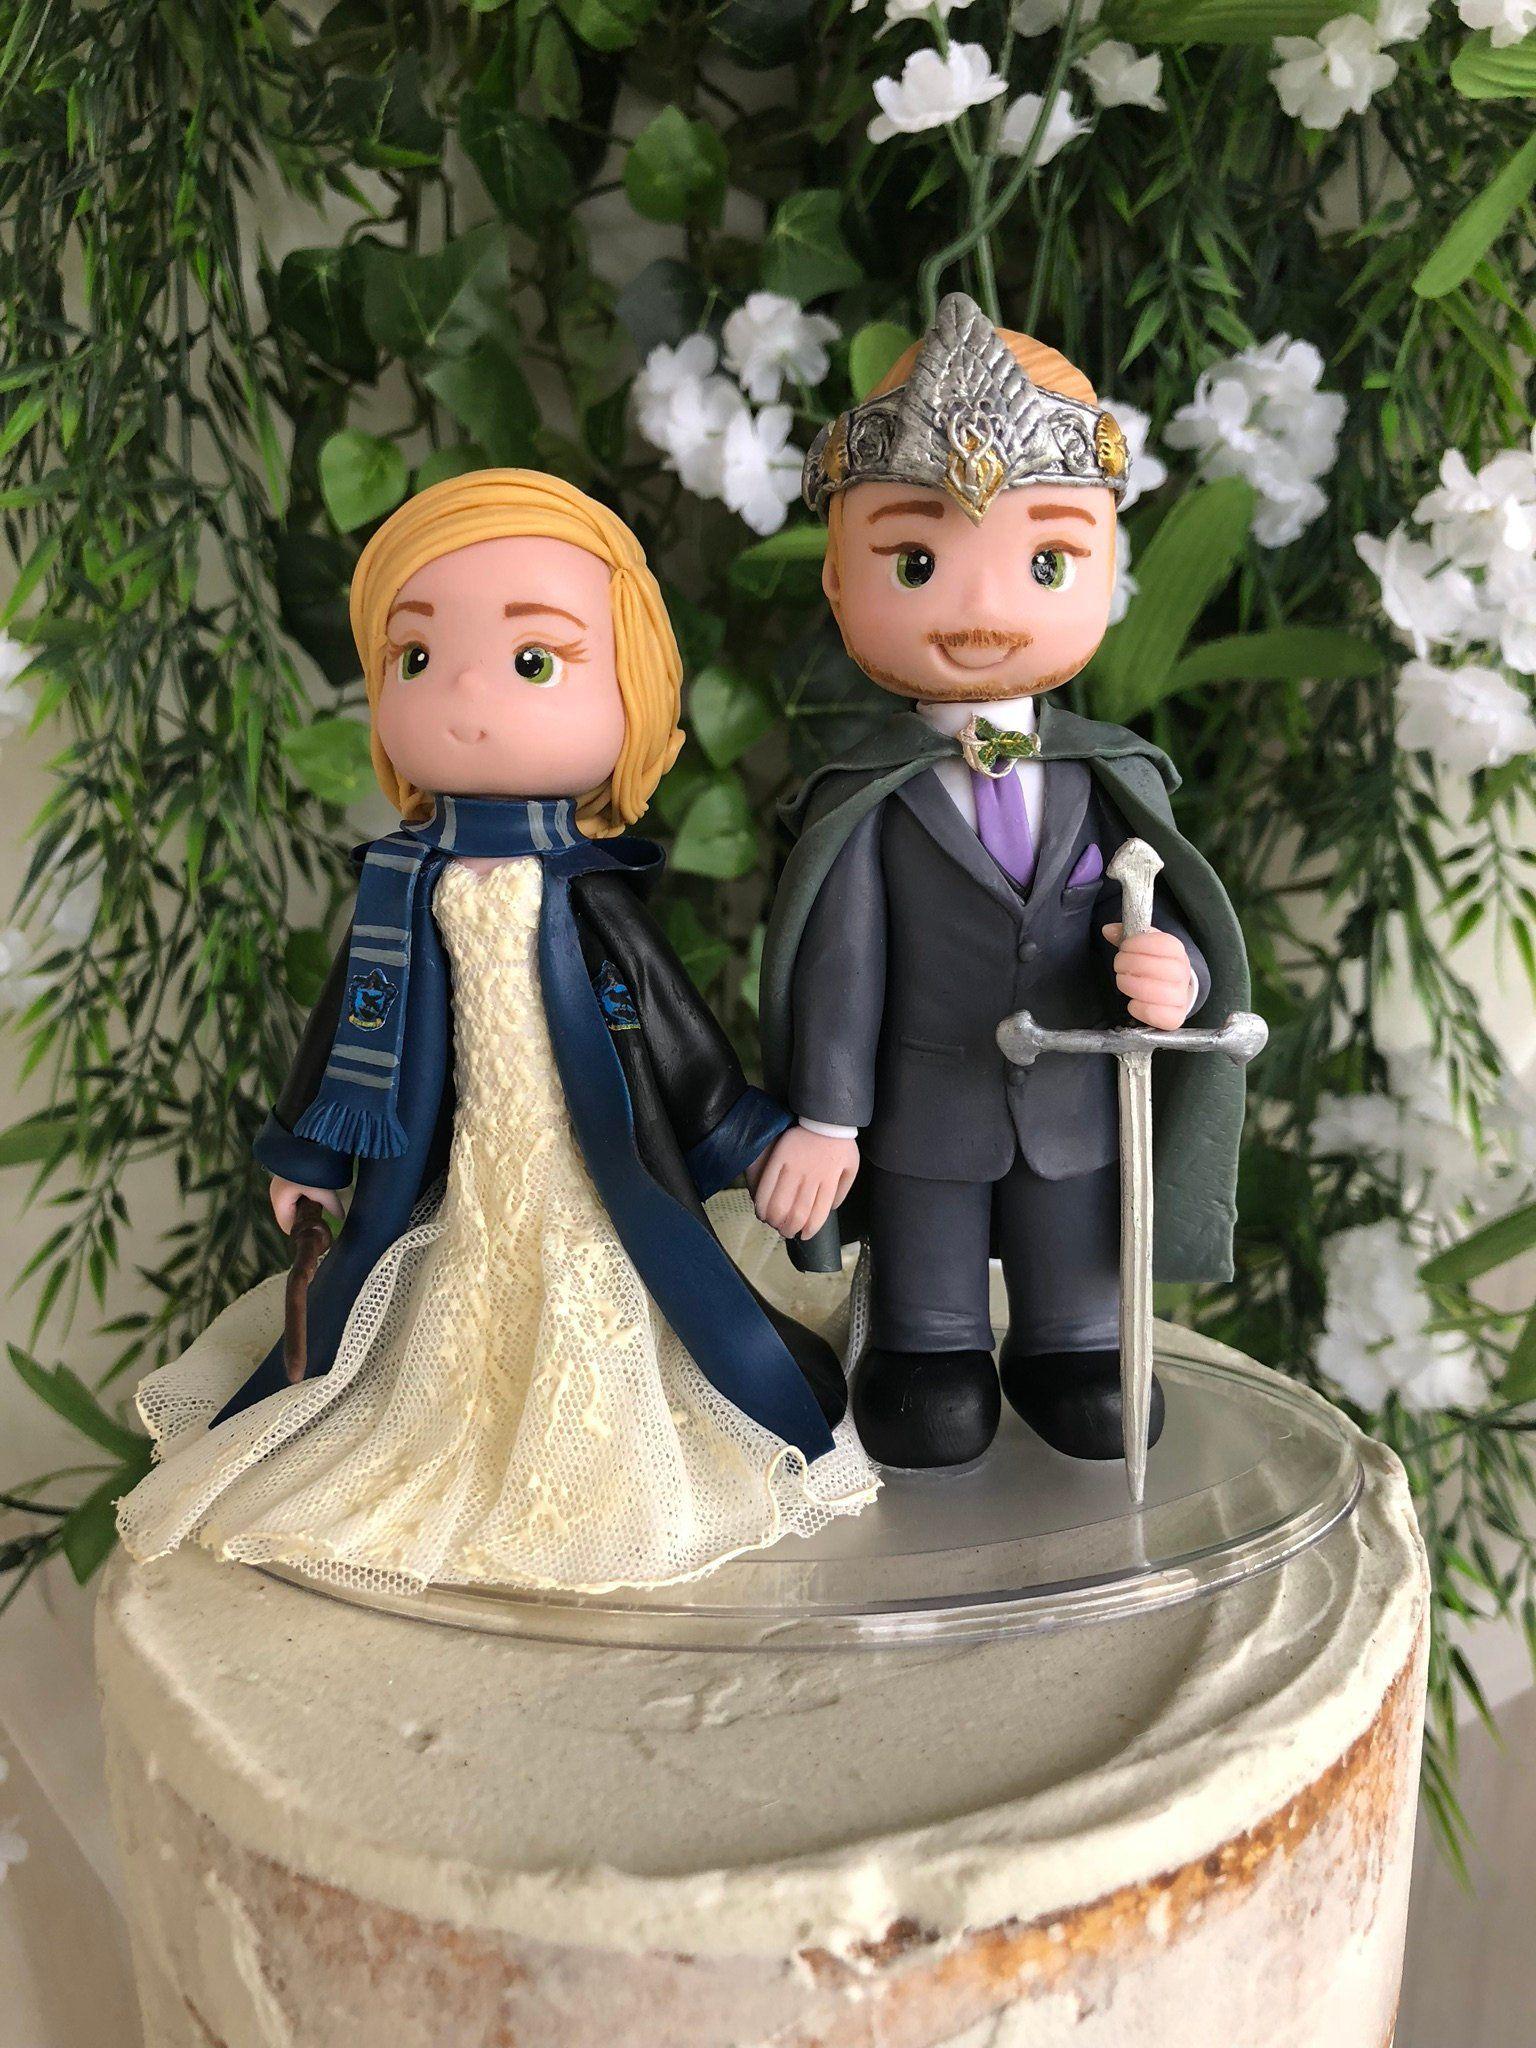 Aragorn And Ravenclaw Wedding Cake Topper Figurine Wedding Cake